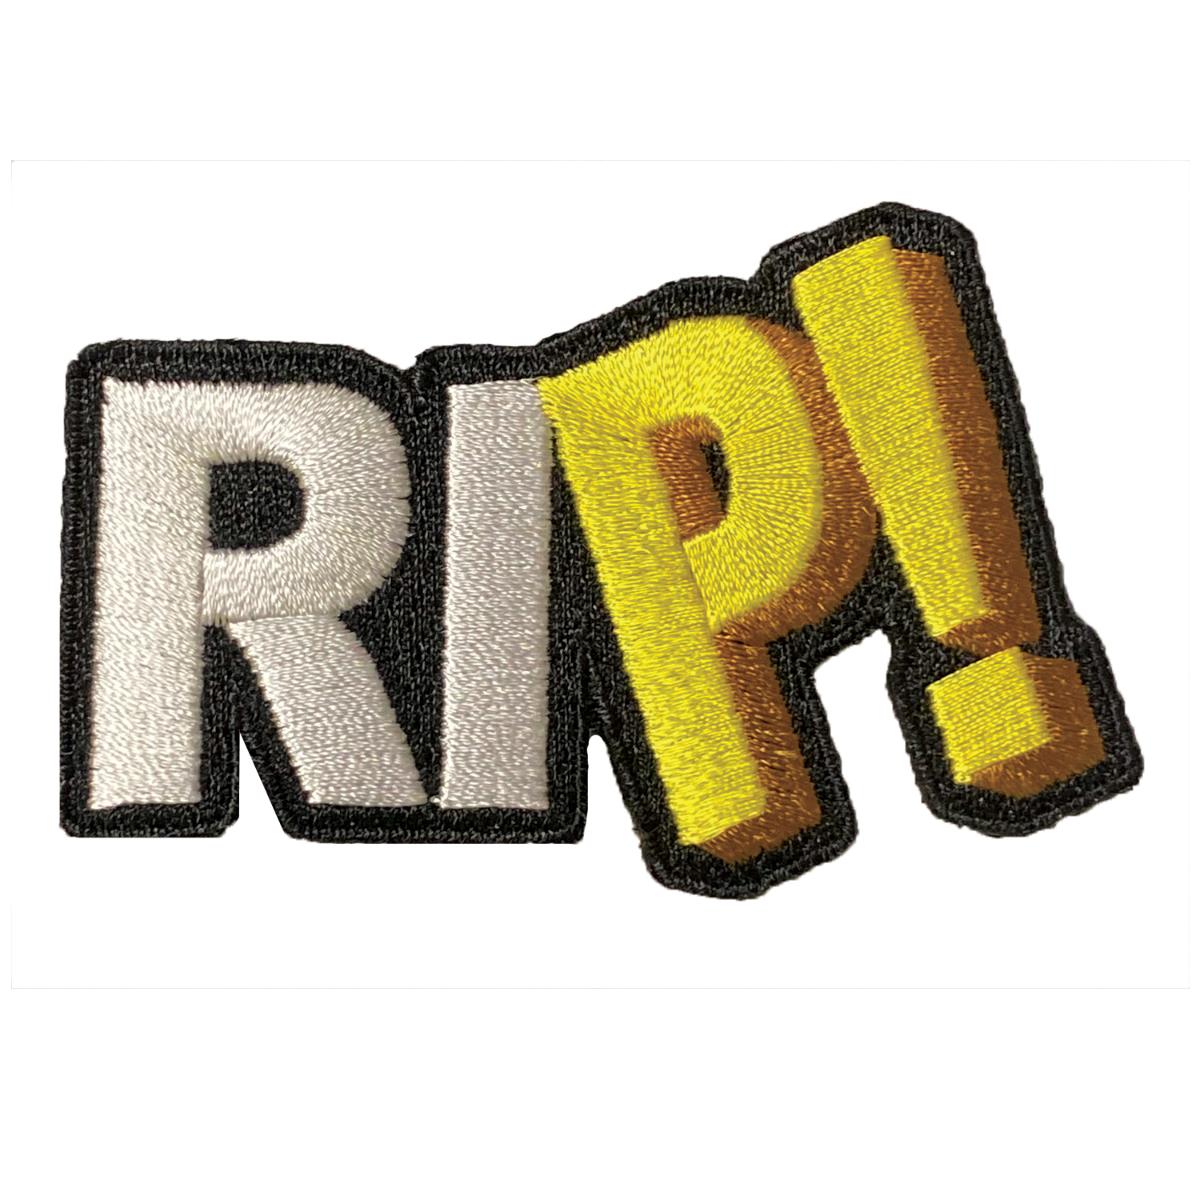 Sean Price RIP! Iron-On Patch